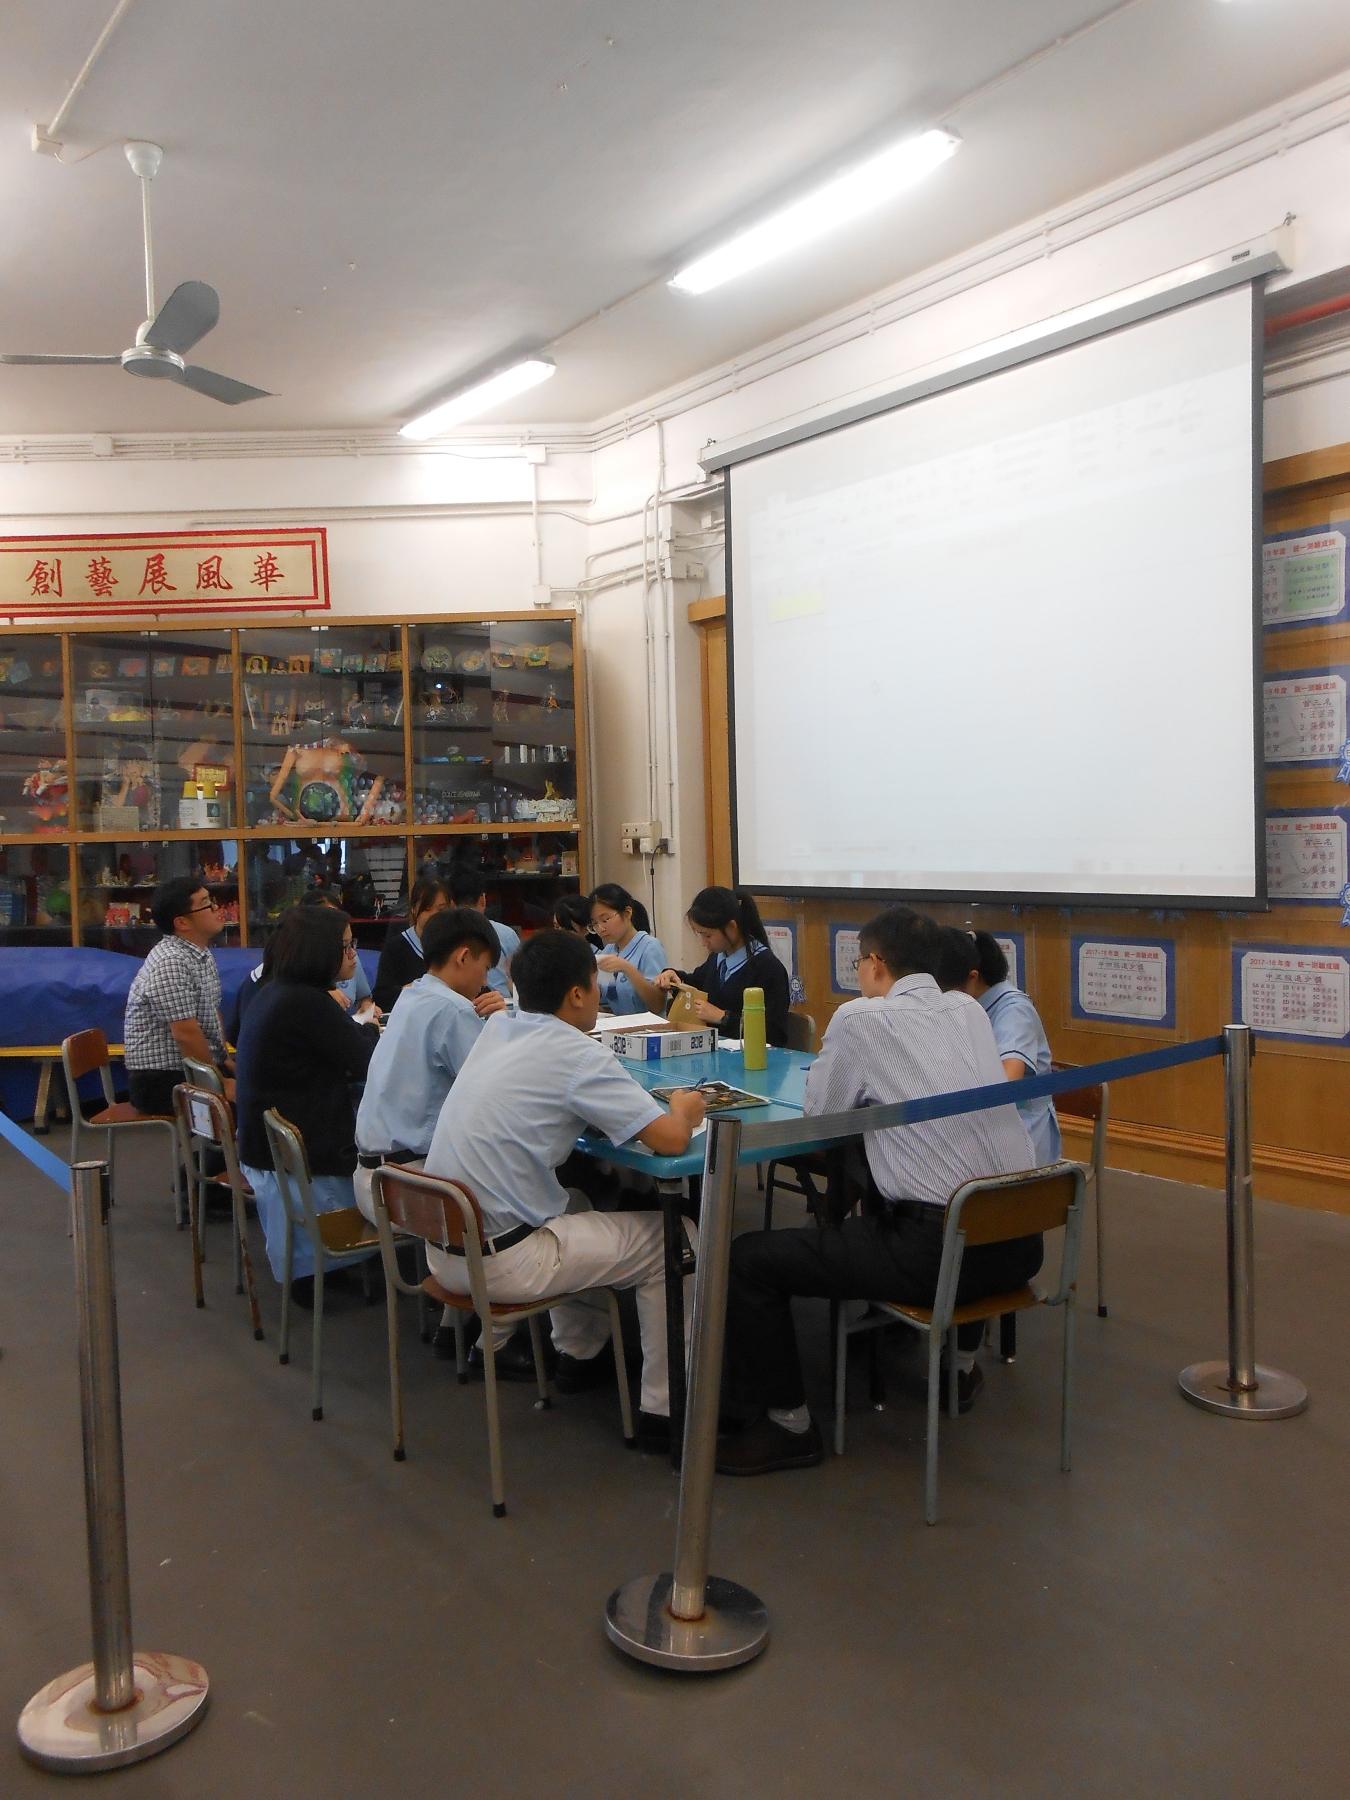 http://npc.edu.hk/sites/default/files/dscn2043.jpg